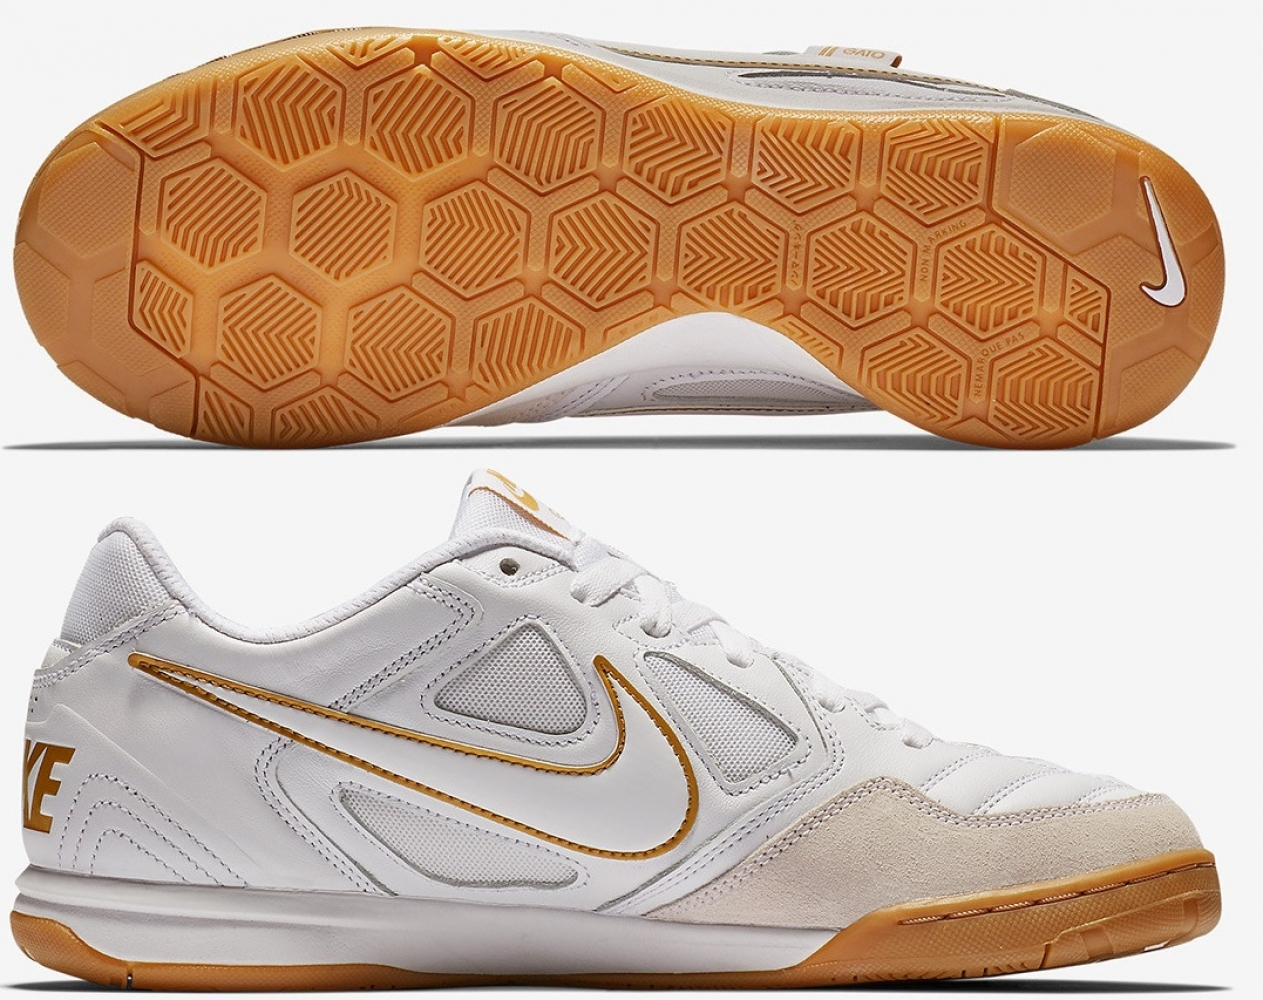 54ecd4b17f702 Футзалки Nike SB Gato AT4607-100 купить в интернет-магазине Sport ...